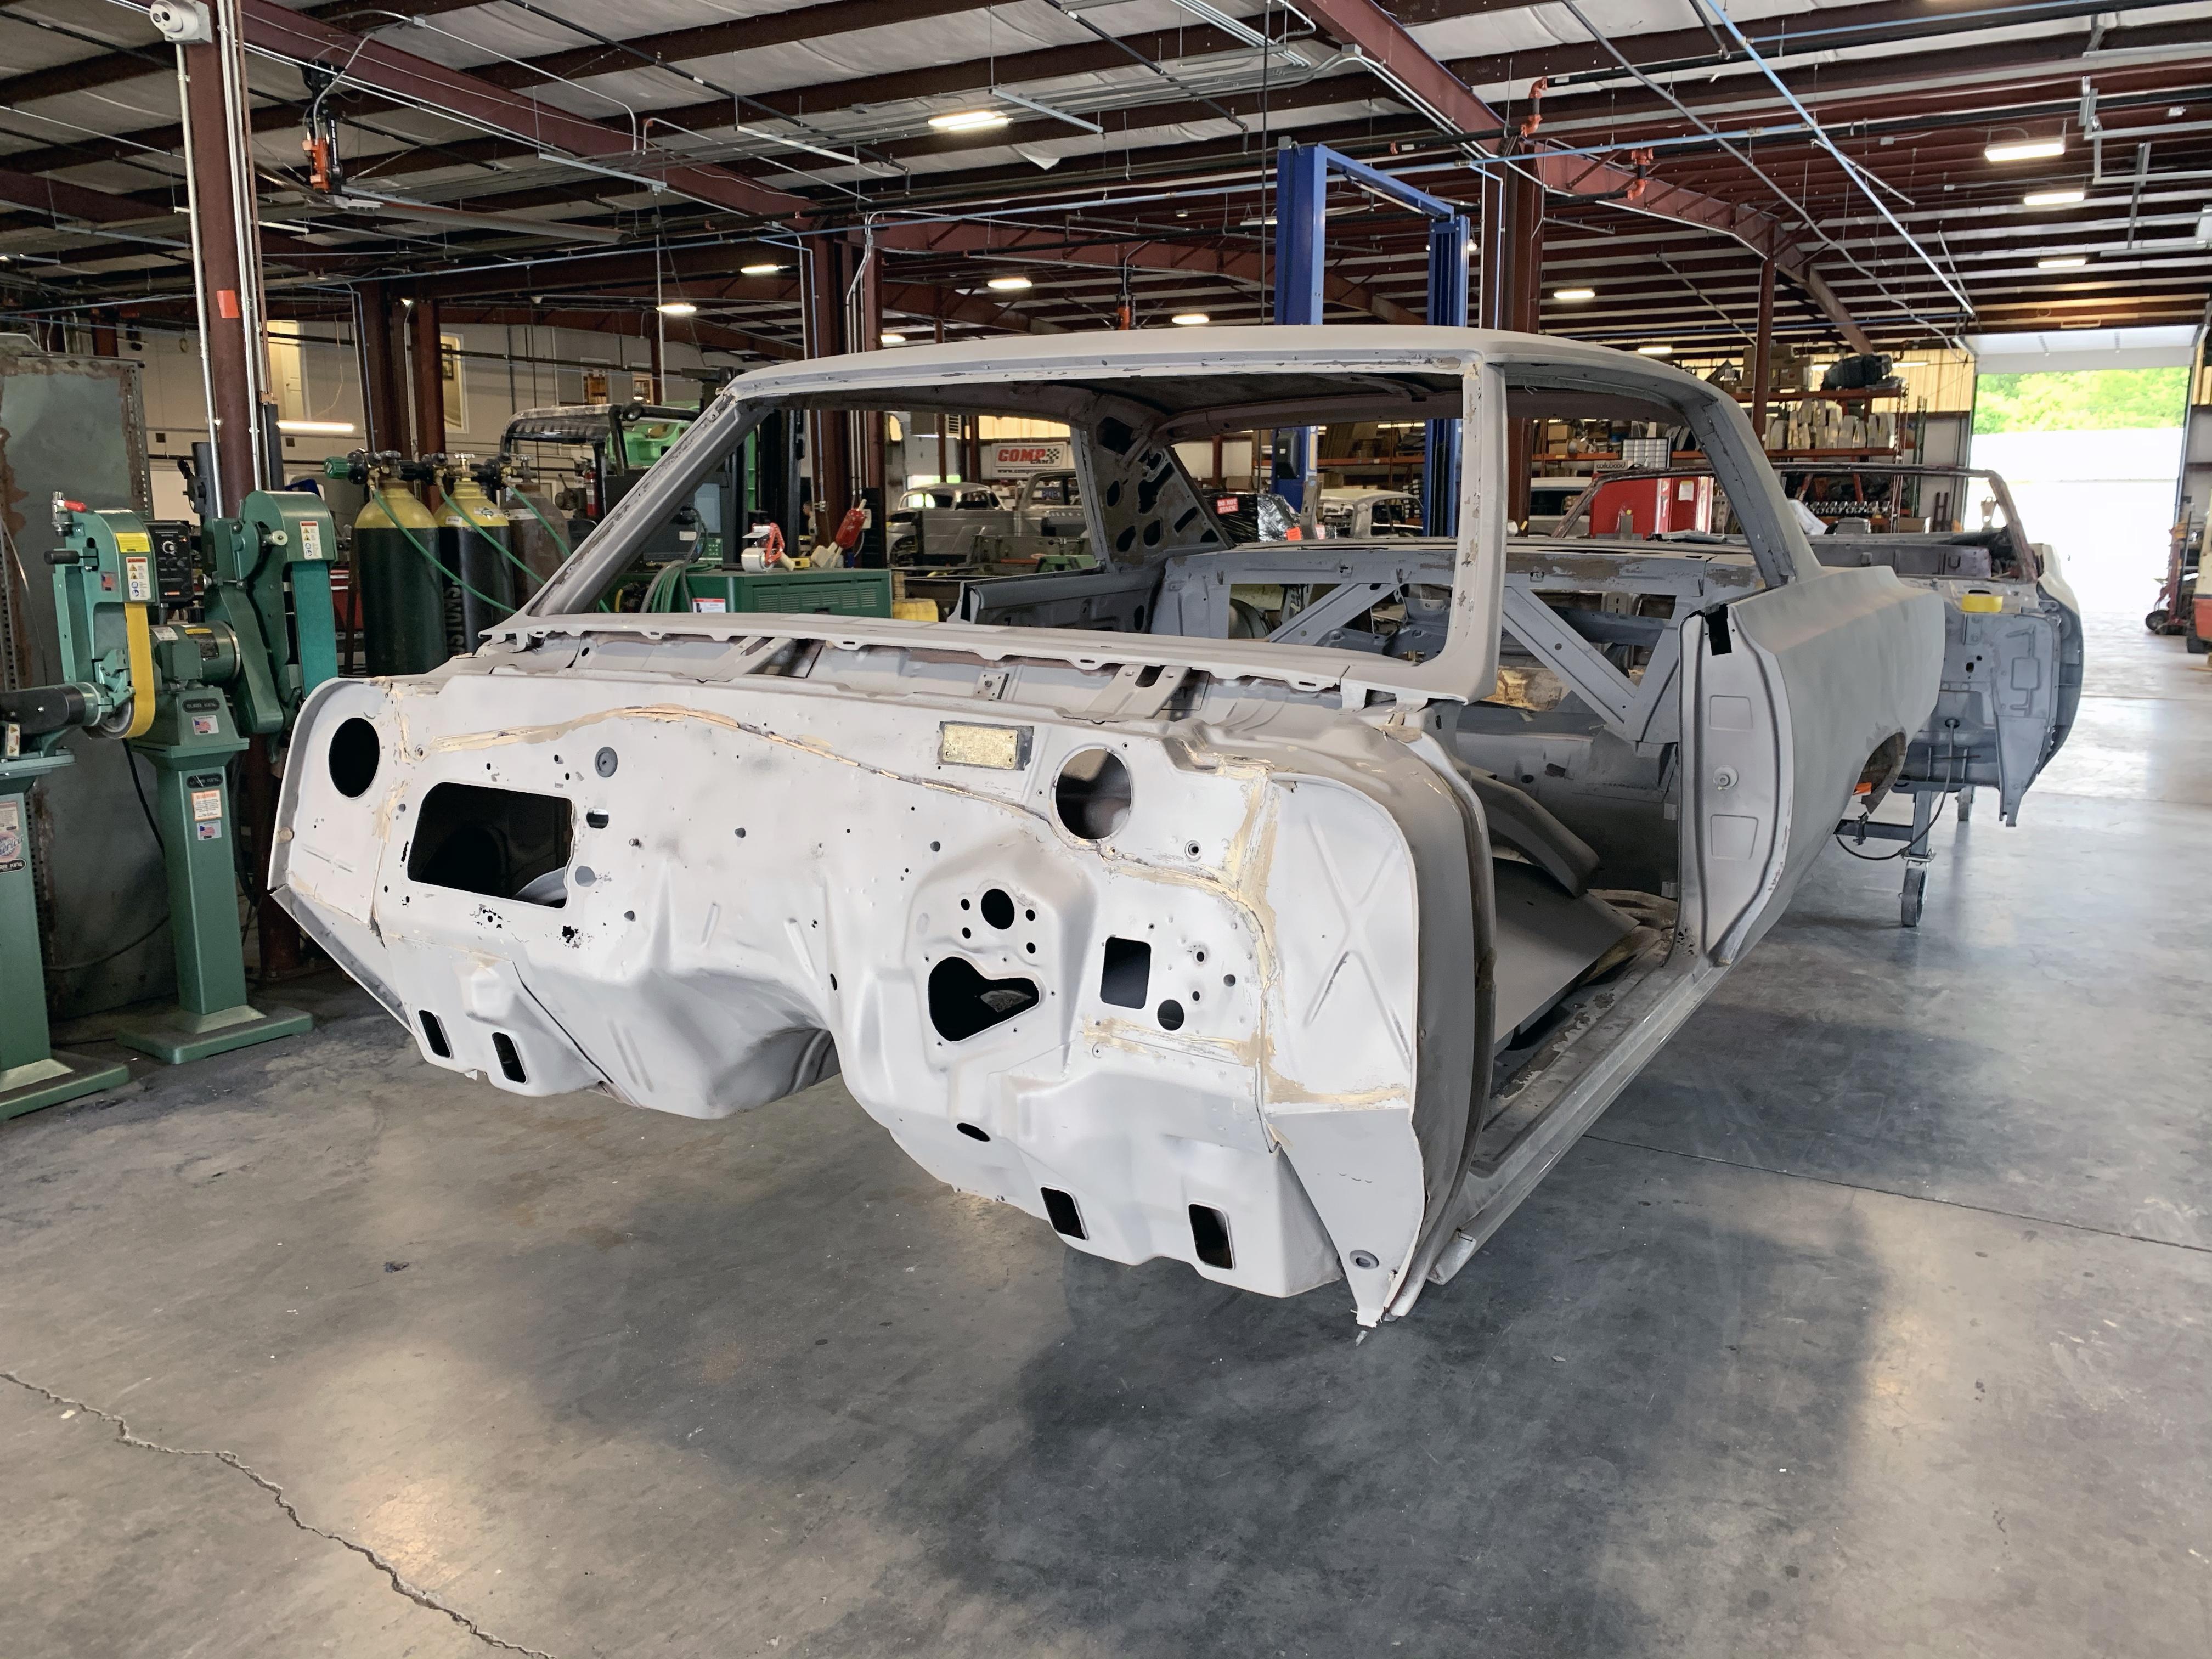 scotts-hotrods-65-cutlass-project-1